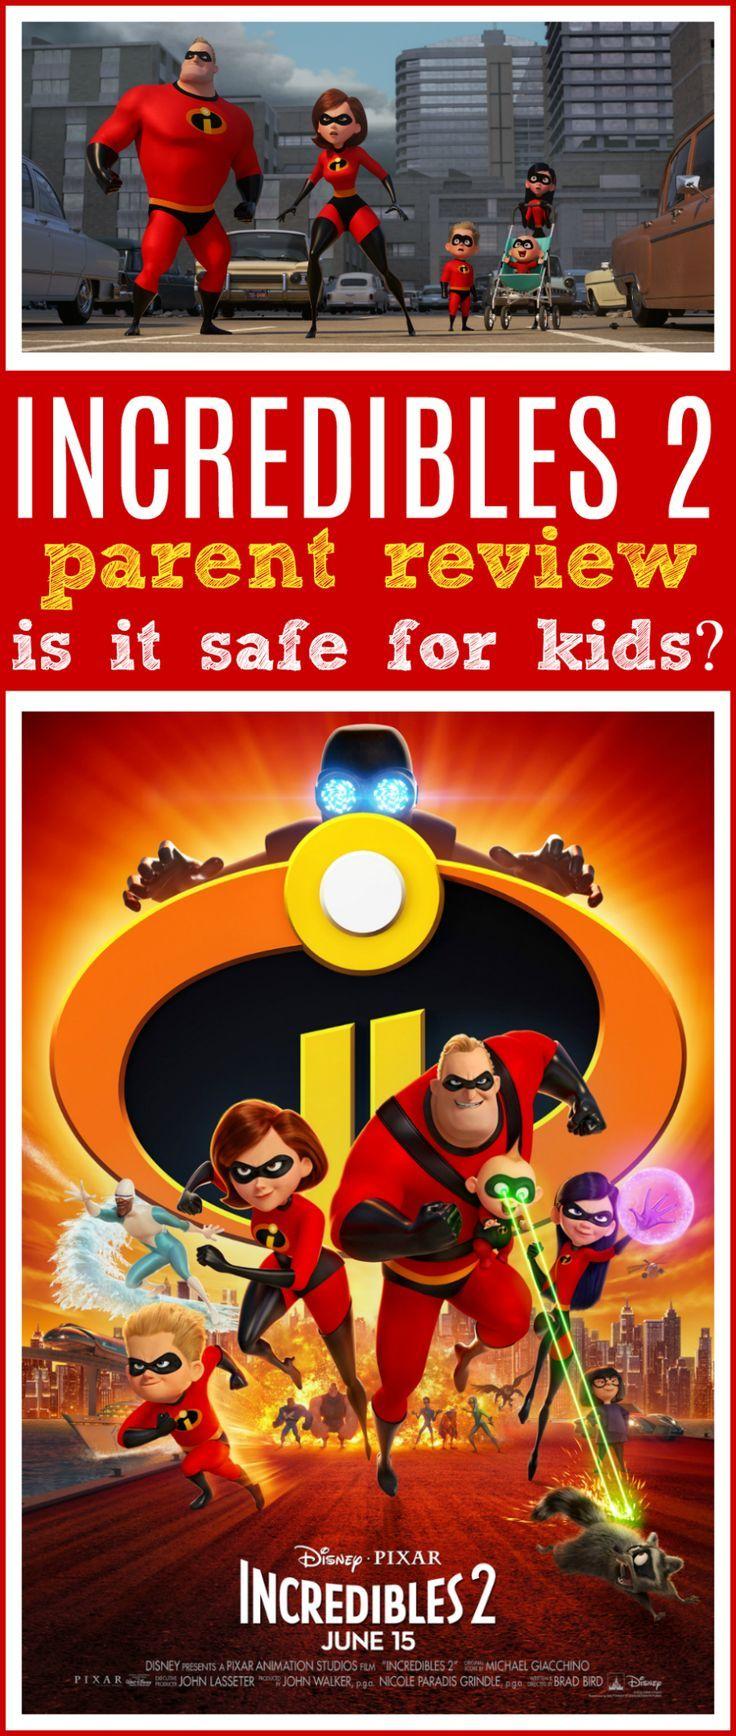 Incredibles 2 Movie Review 2 movie, Kids safe, Disney